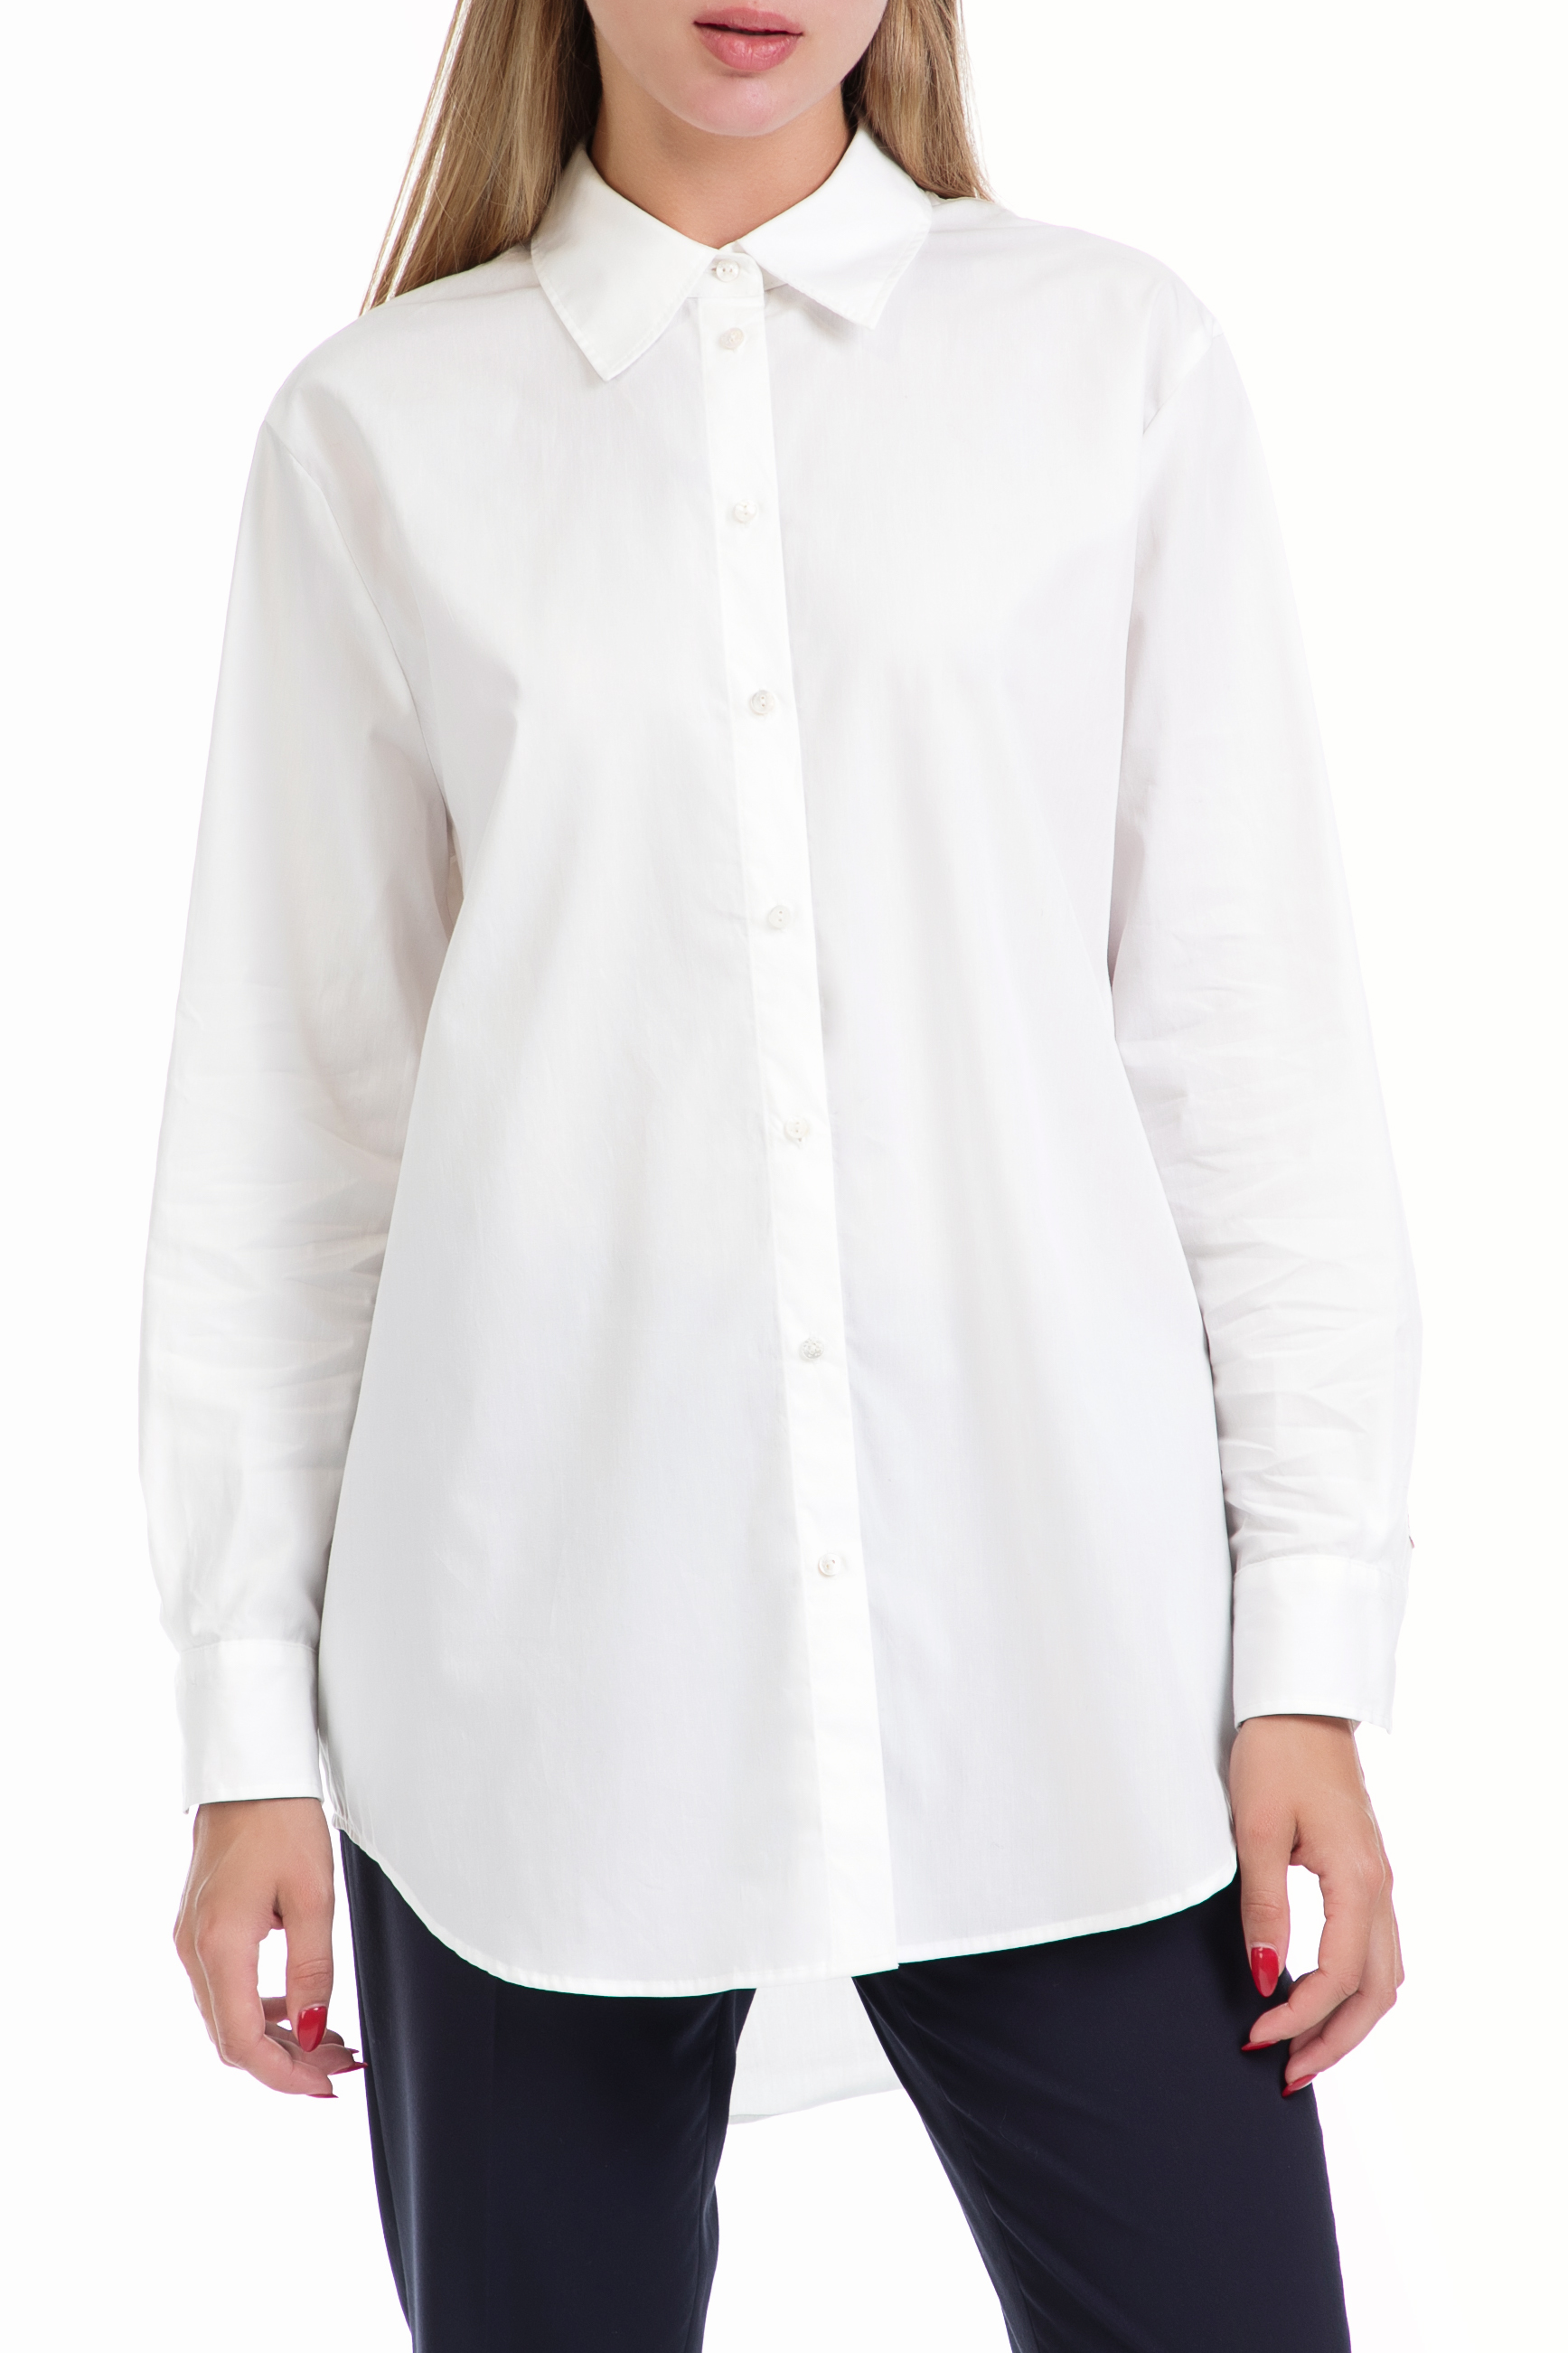 dea5e59c860b SCOTCH   SODA - Γυναικείο πουκάμισο Maison Scotch λευκό